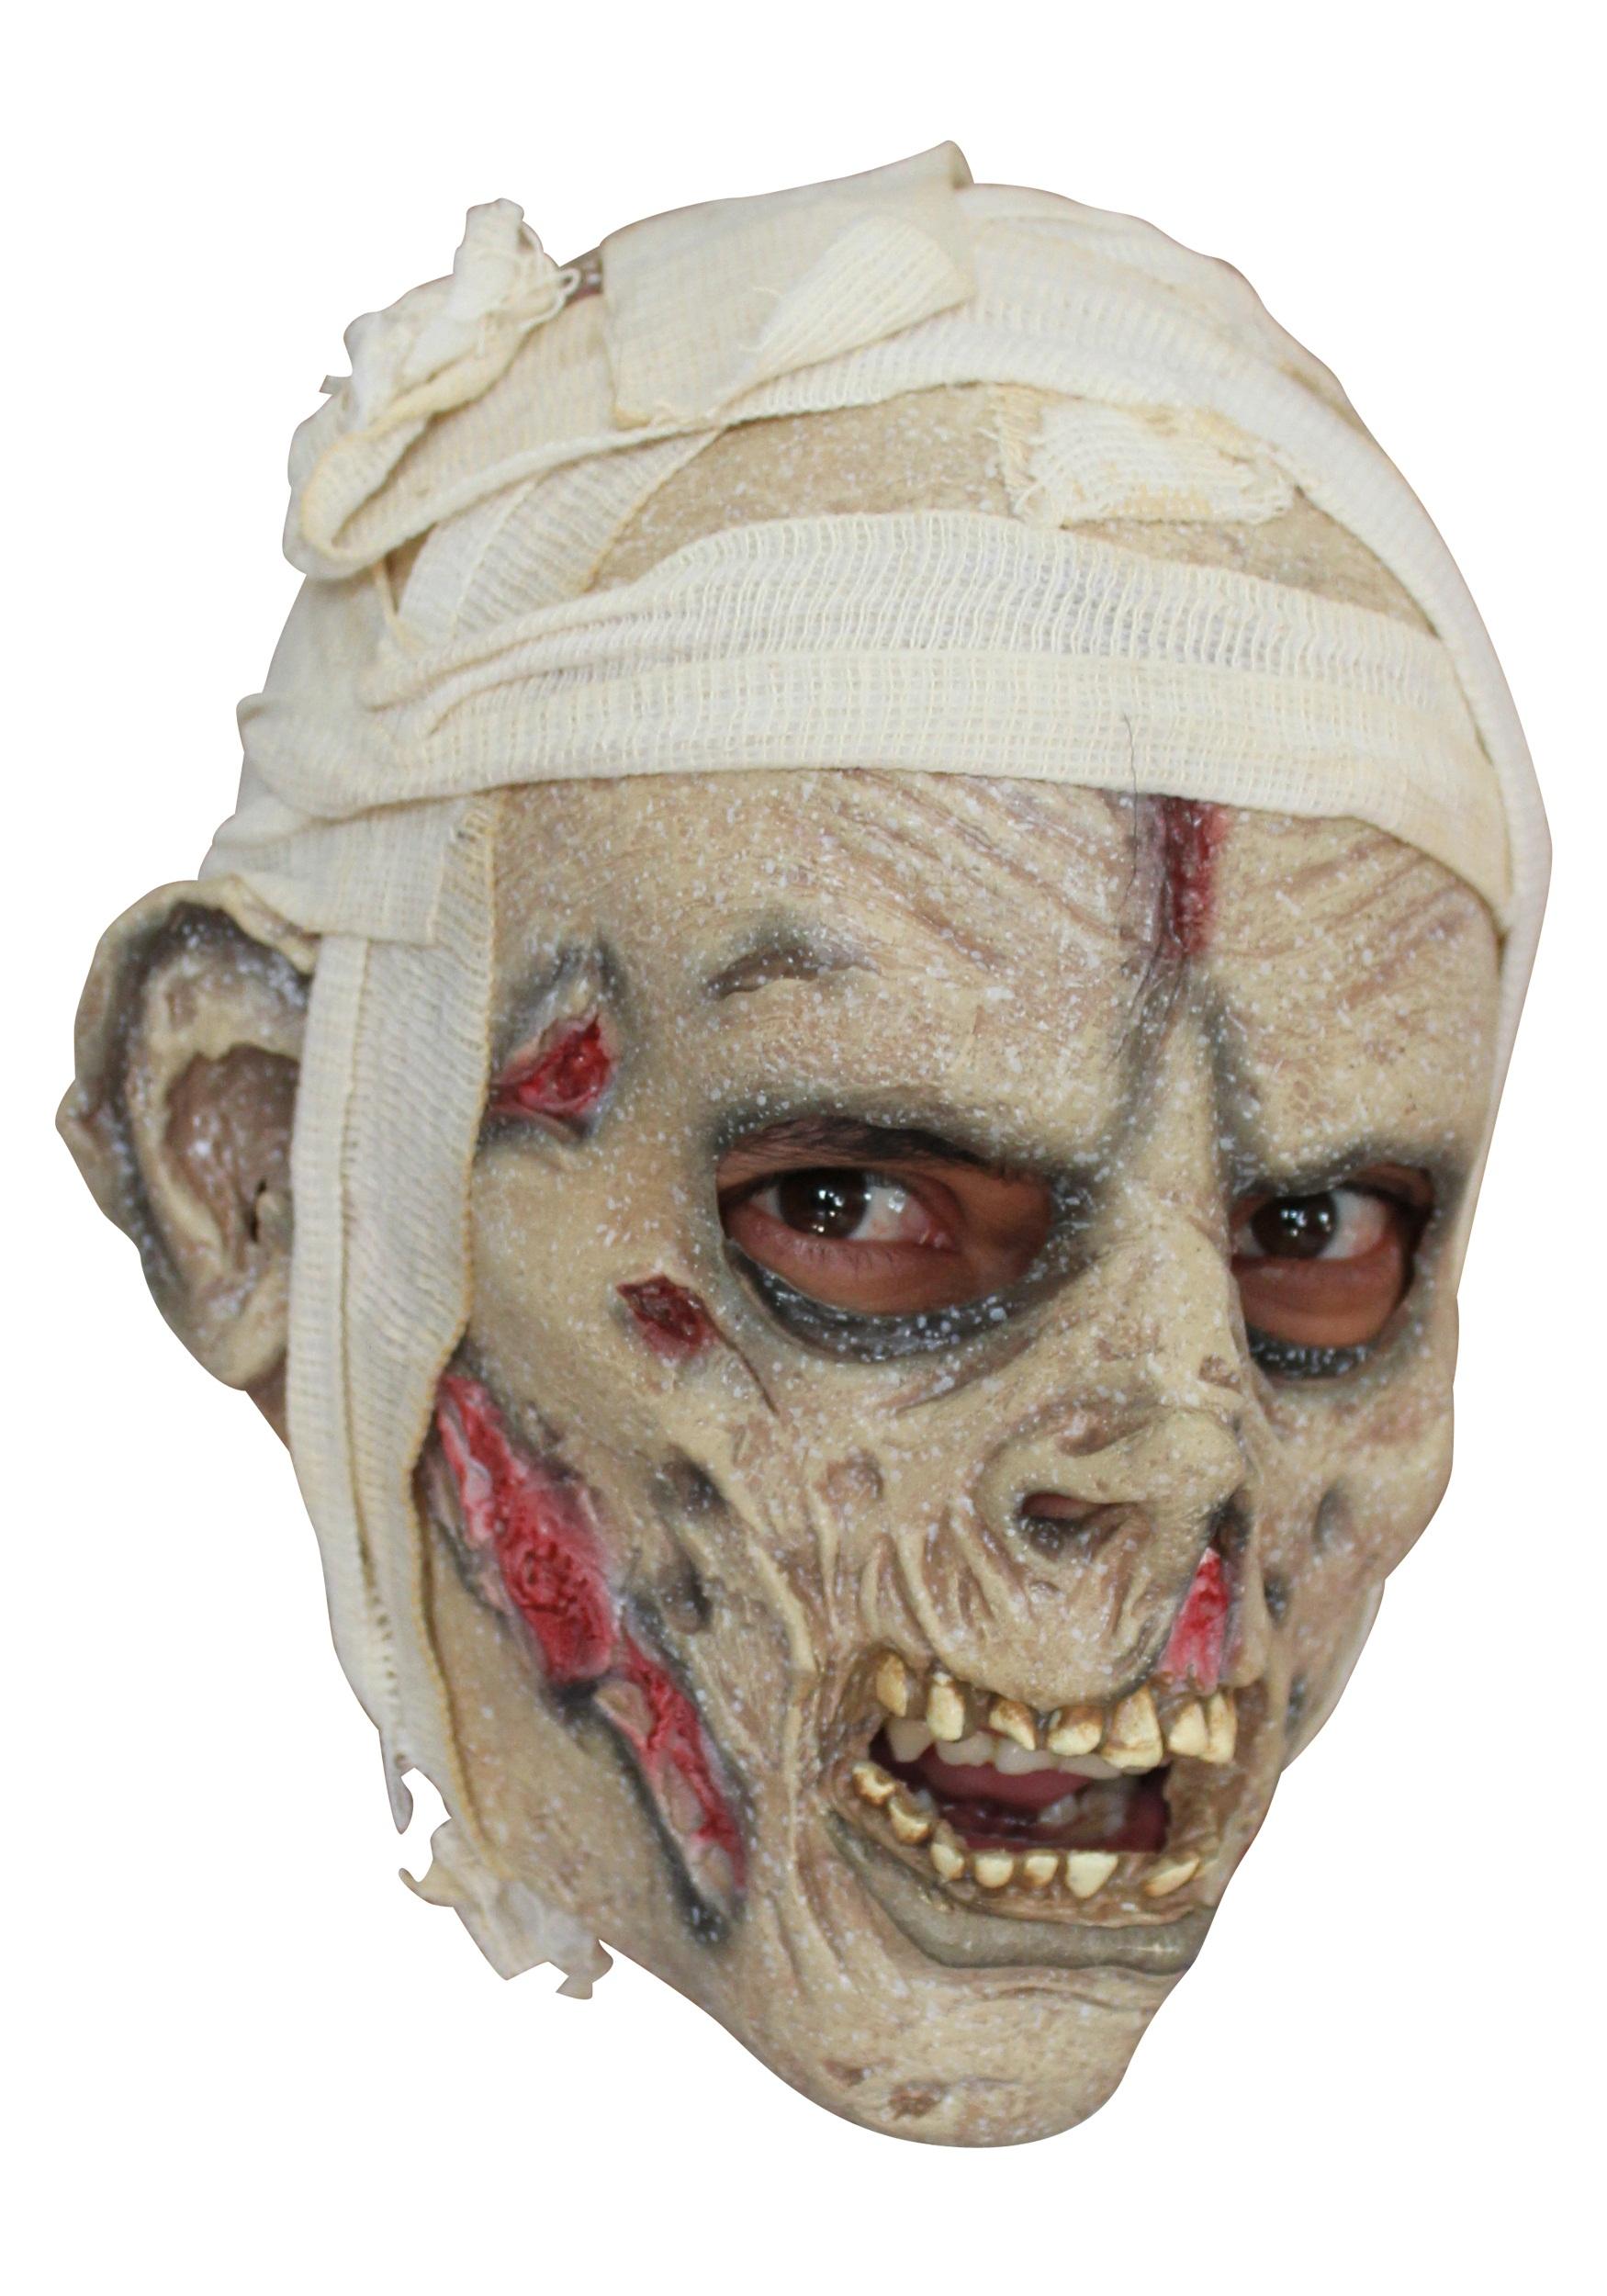 Halloween door decorations mummy - Pinterest Google Twitter Facebook